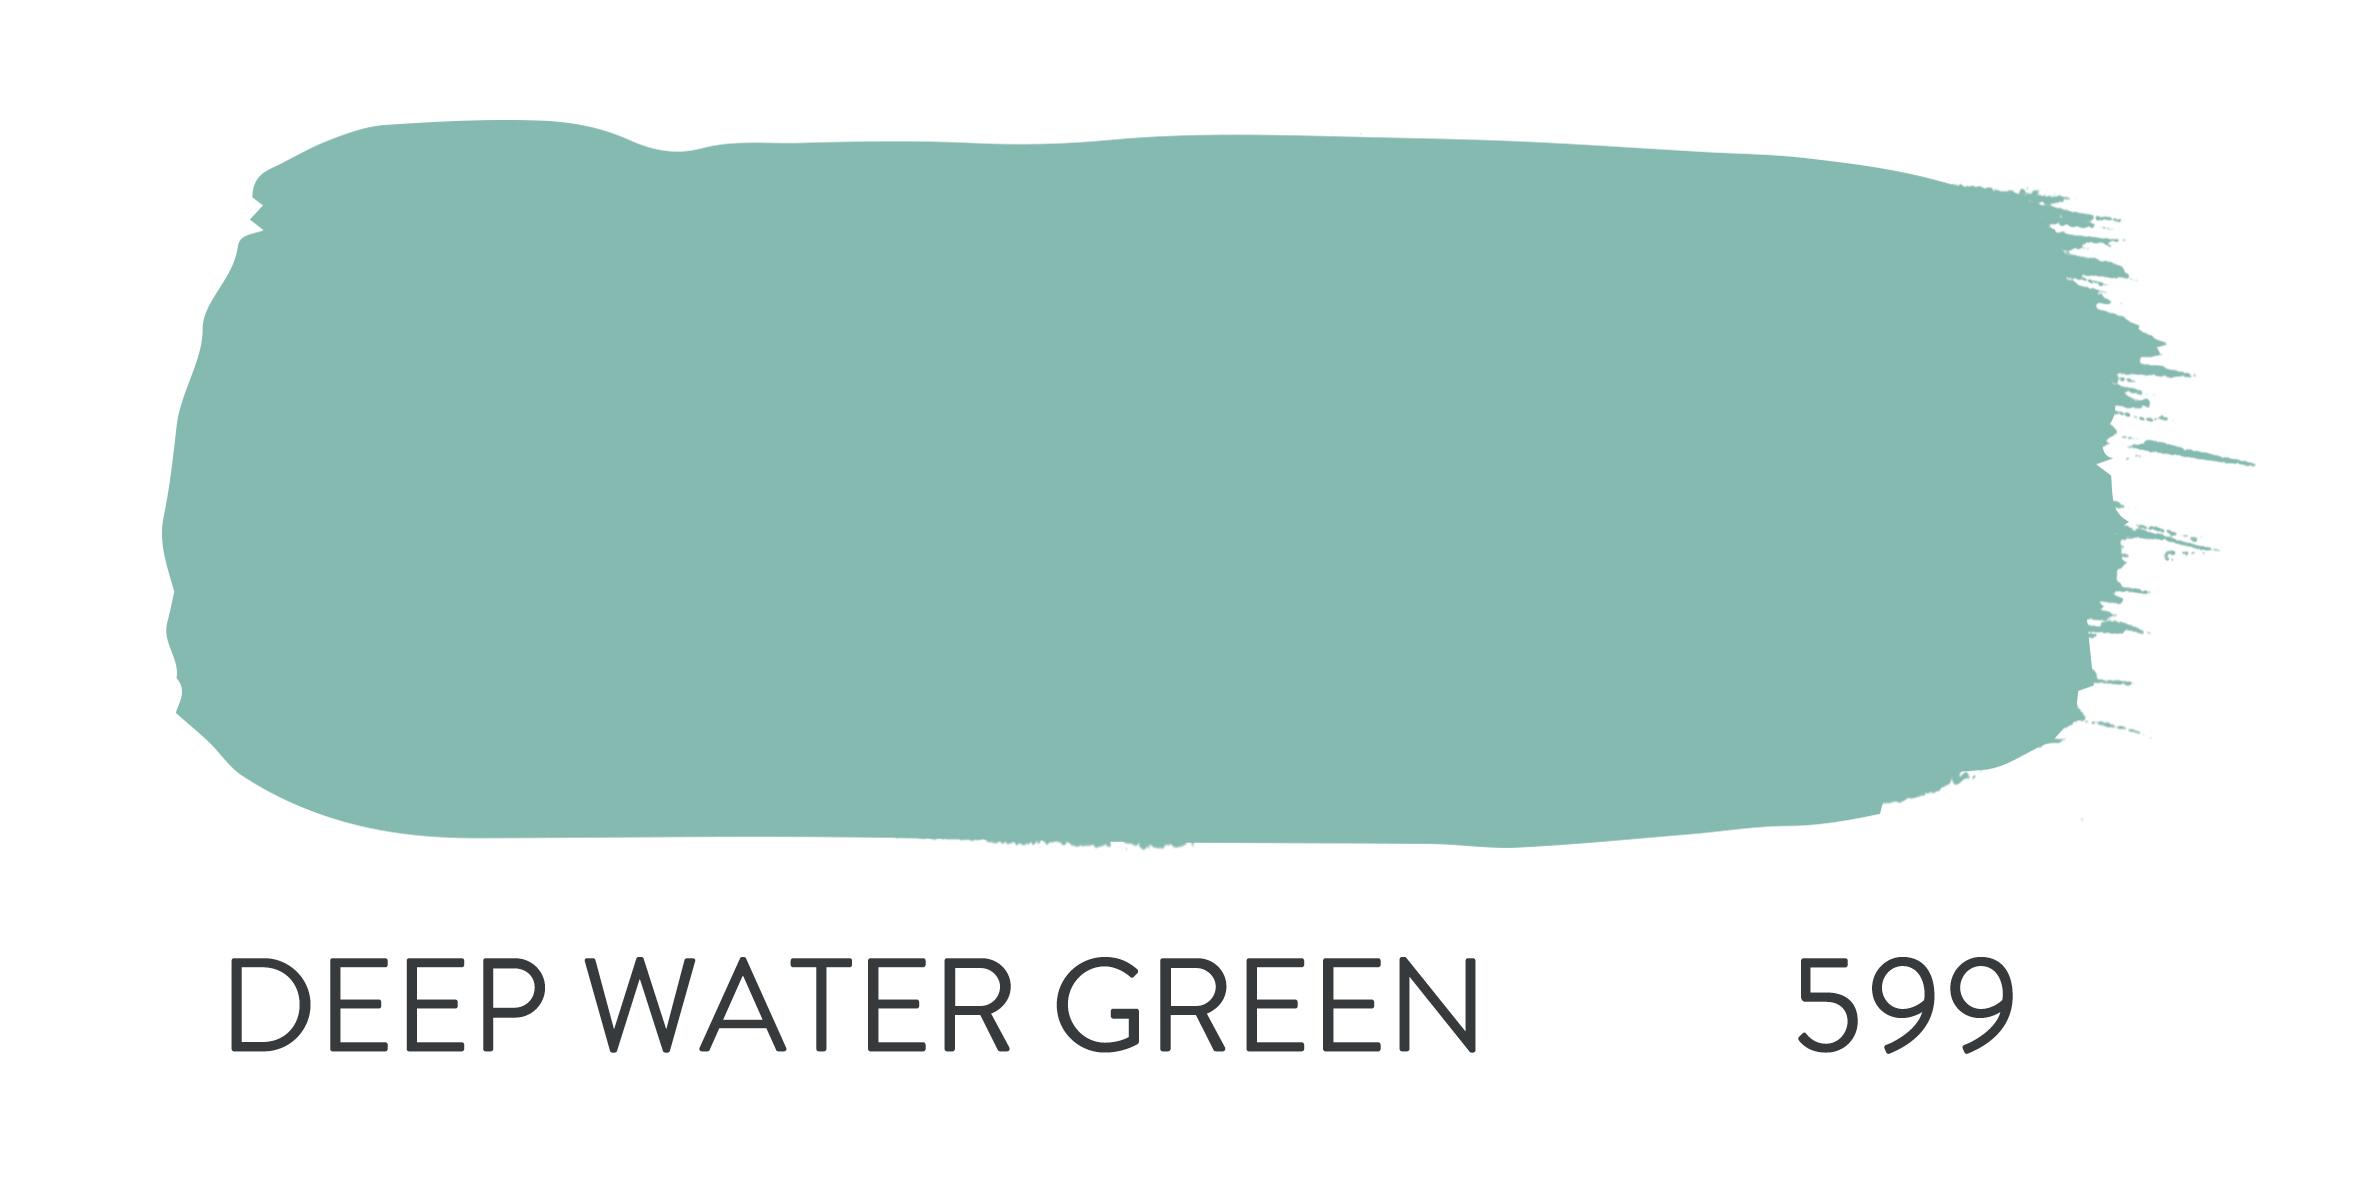 DEEP WATER GREEN 599.jpg